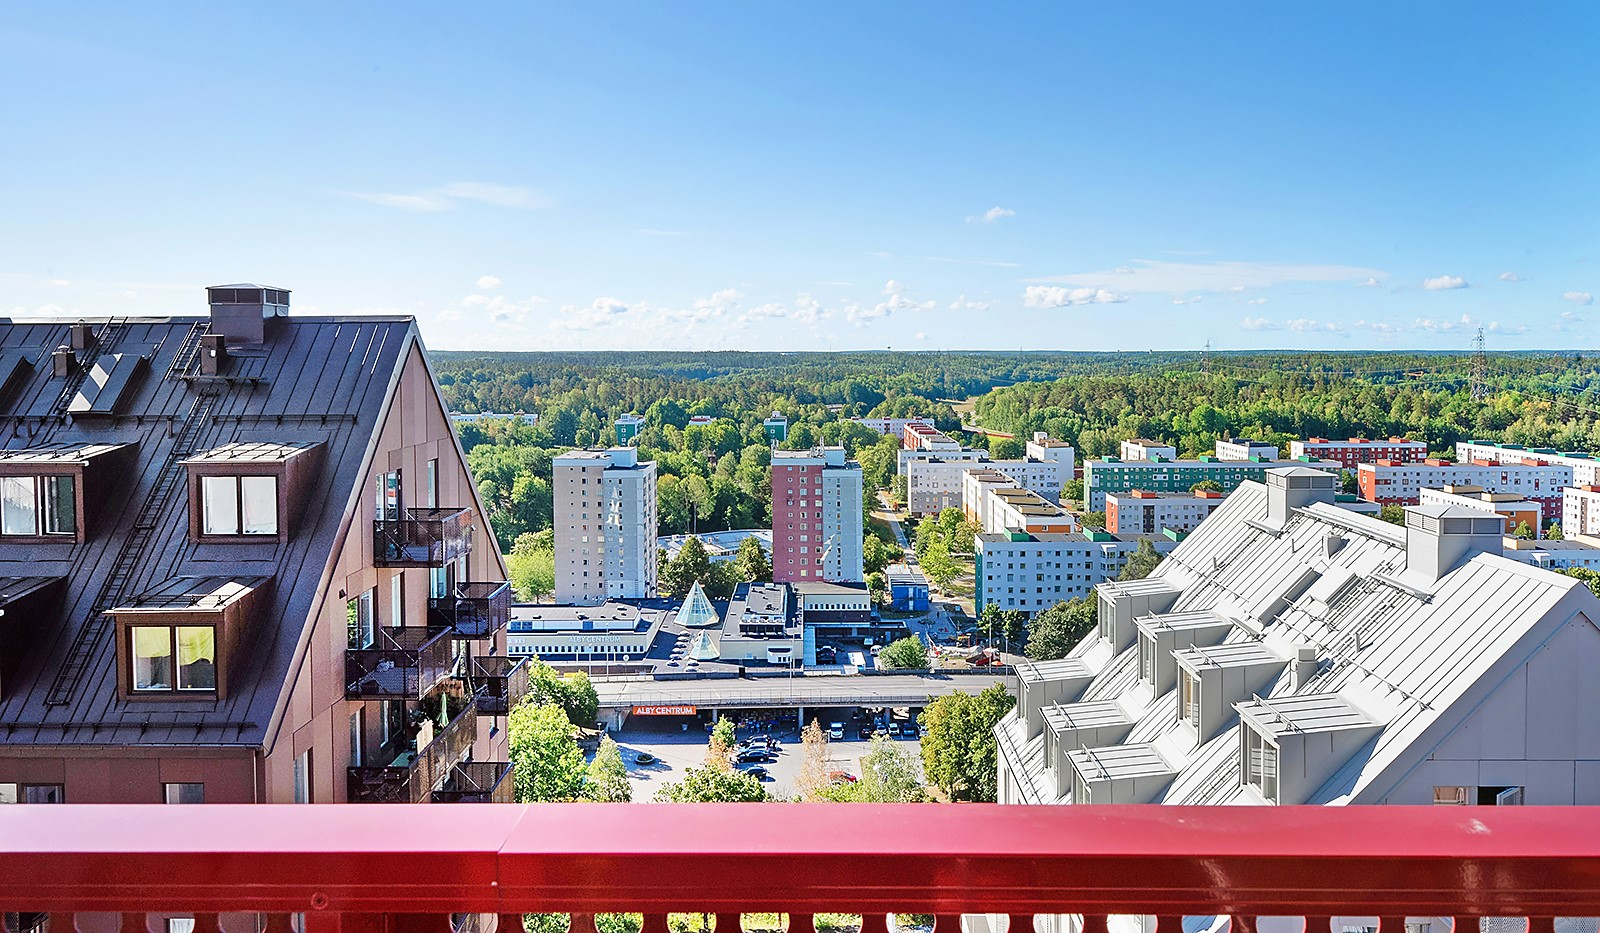 Lagmansbacken 7, 7tr - Utsikt från balkongen